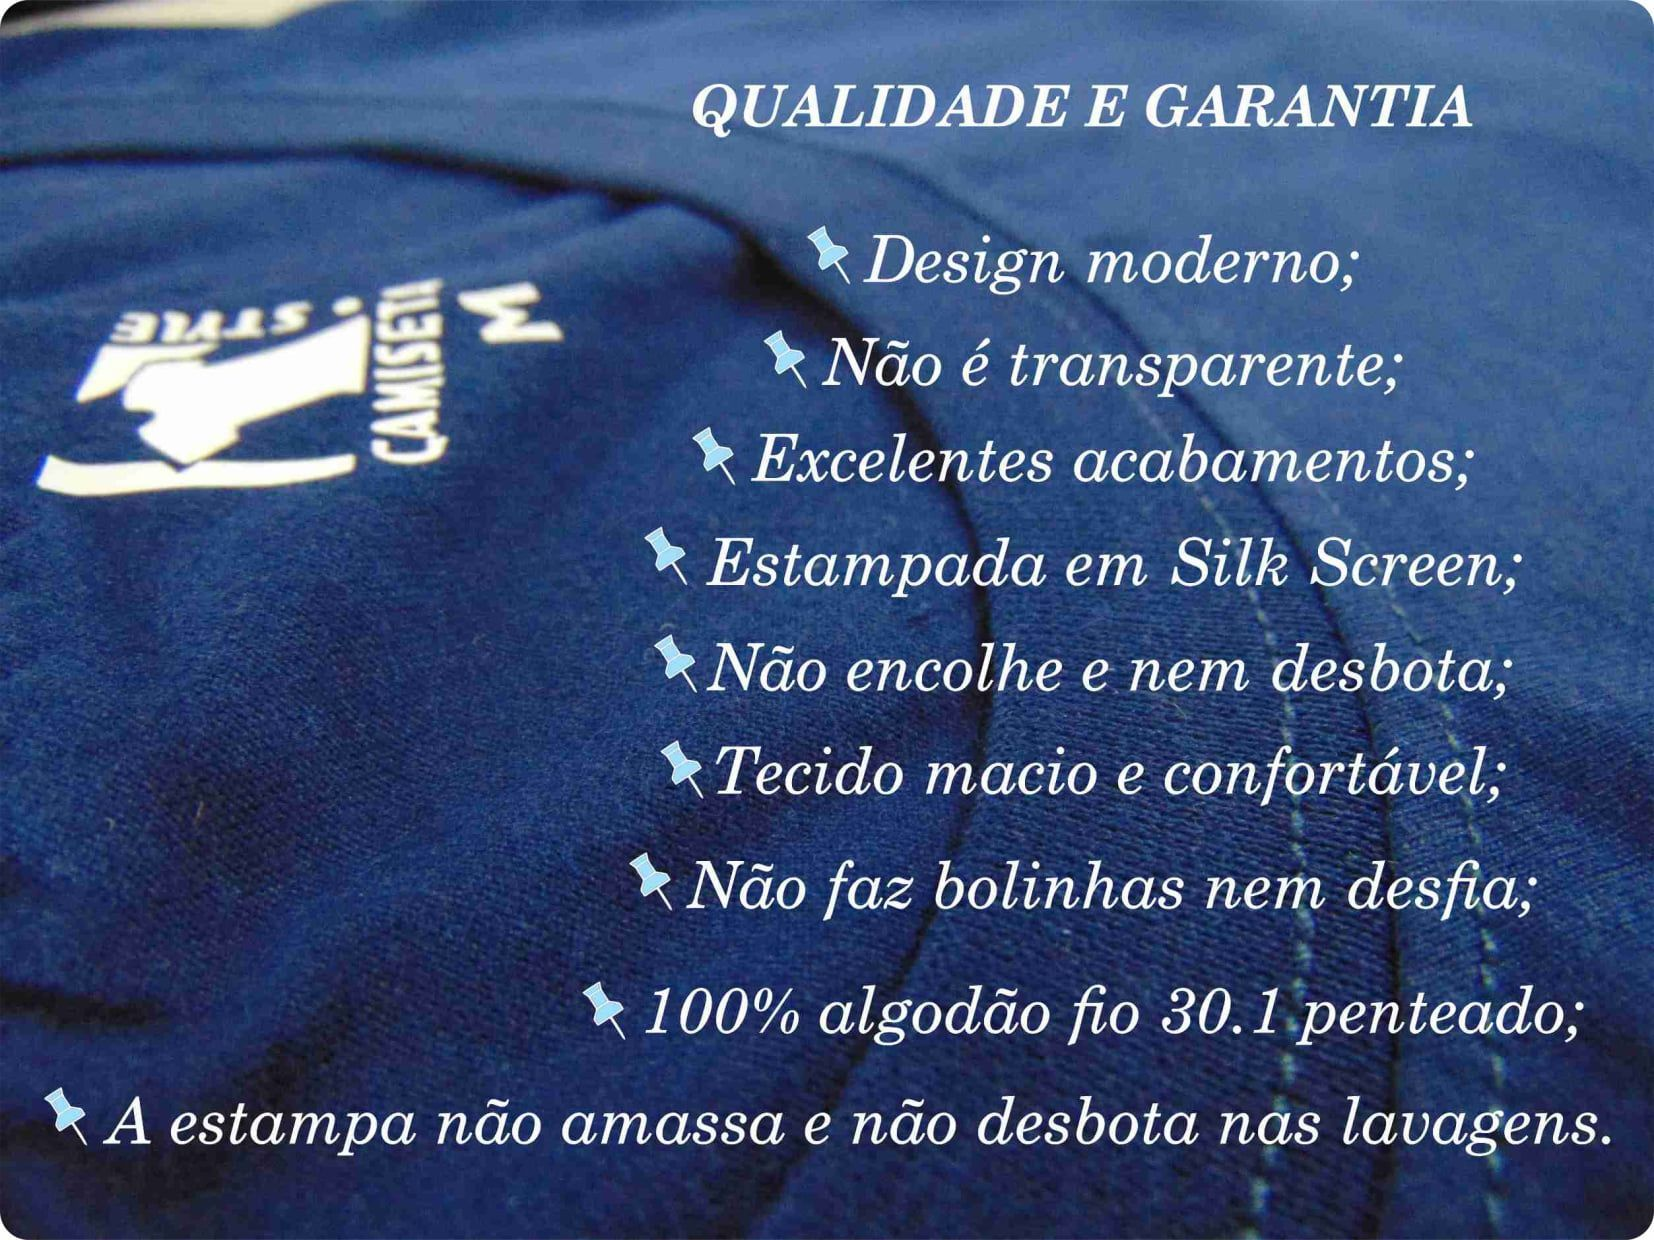 Kit Camiseta Pilha Mae e Filho/a